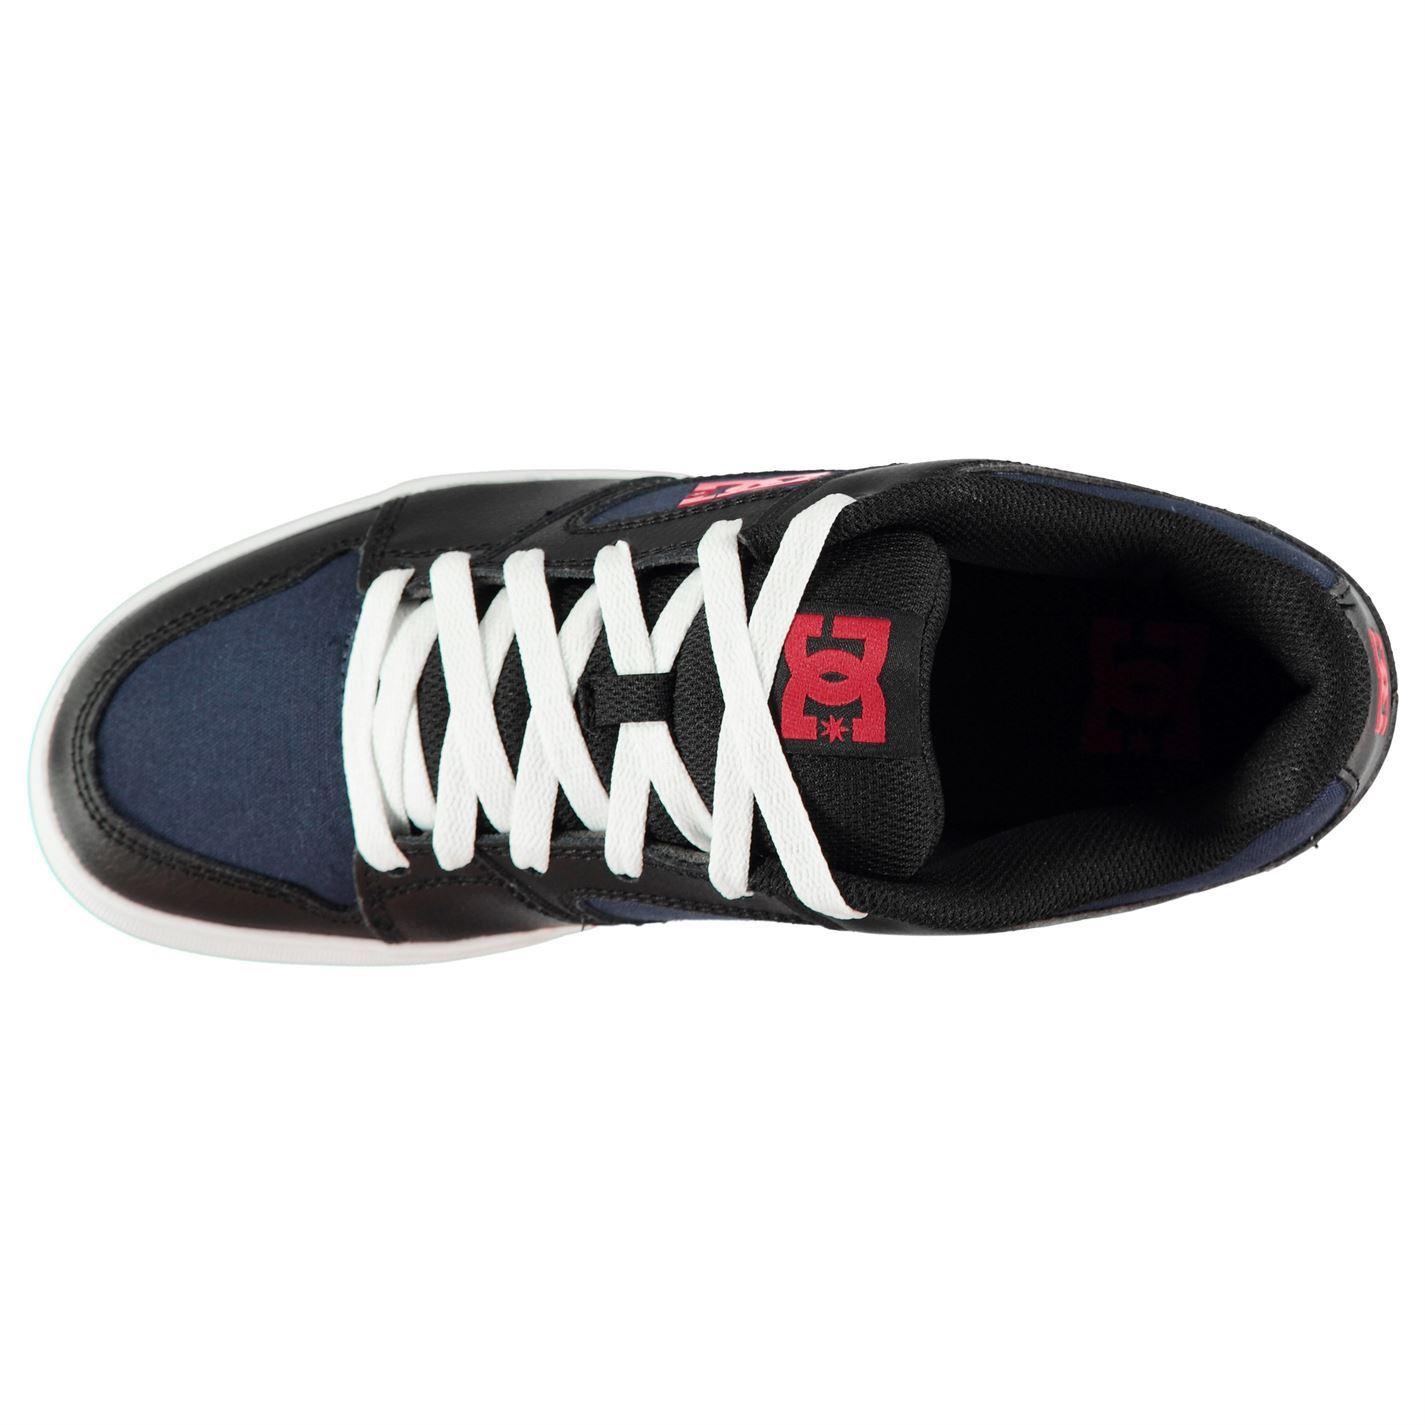 3e162cd2f7 DC Blitz II Skate Shoes Mens Navy/Black/Red Skateboarding Trainers Sneakers